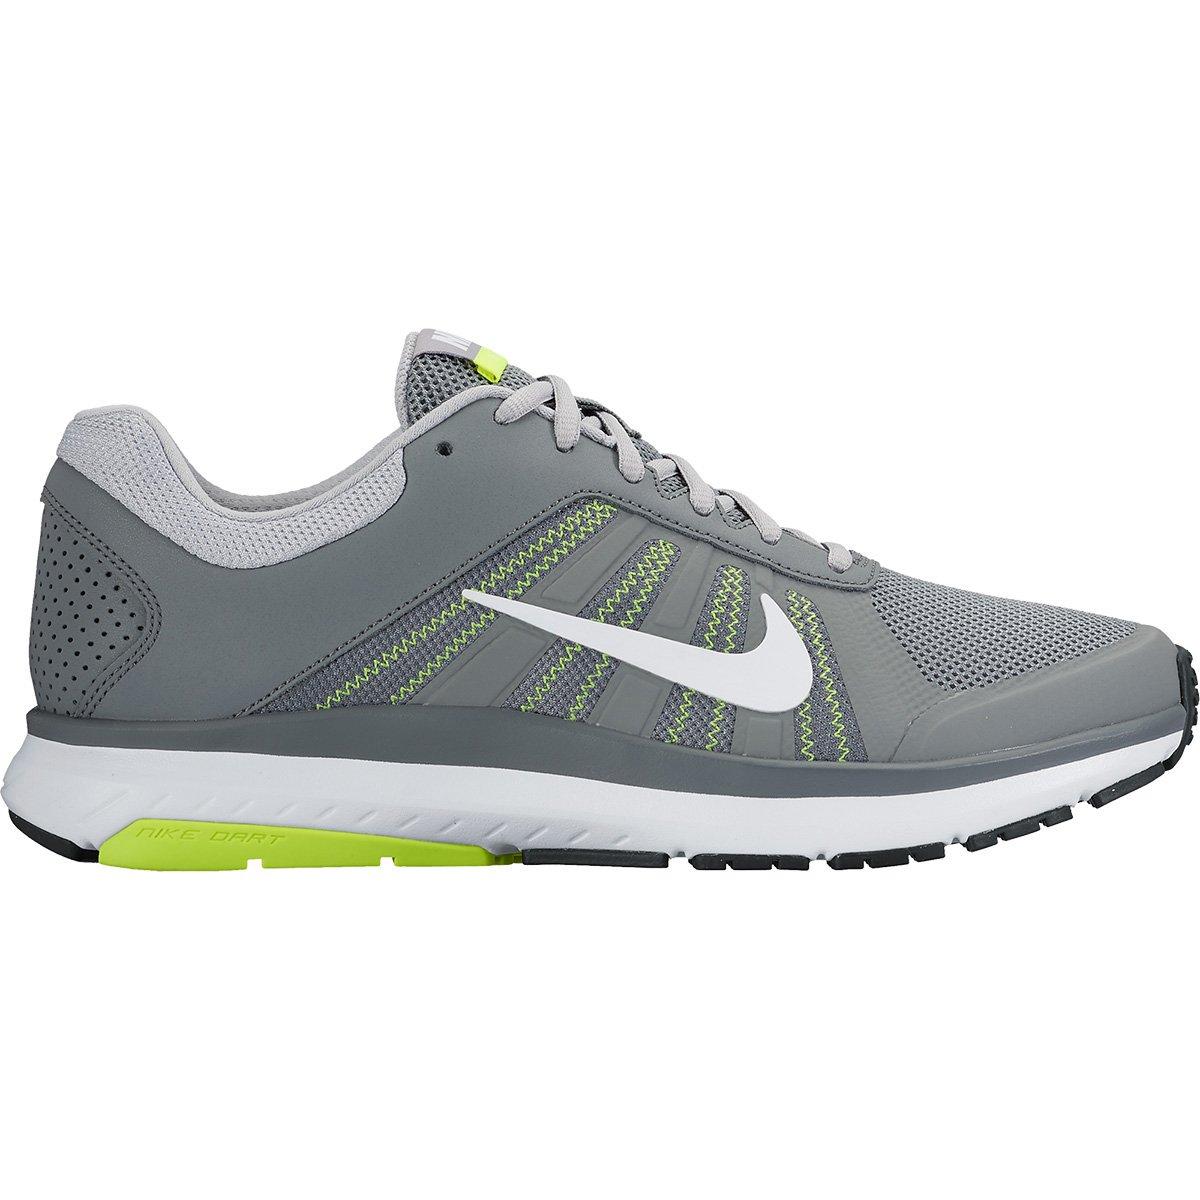 de734ebeb1dc0 Tênis Nike Dart 12 MSL Masculino - Cinza e Branco - Compre Agora ...